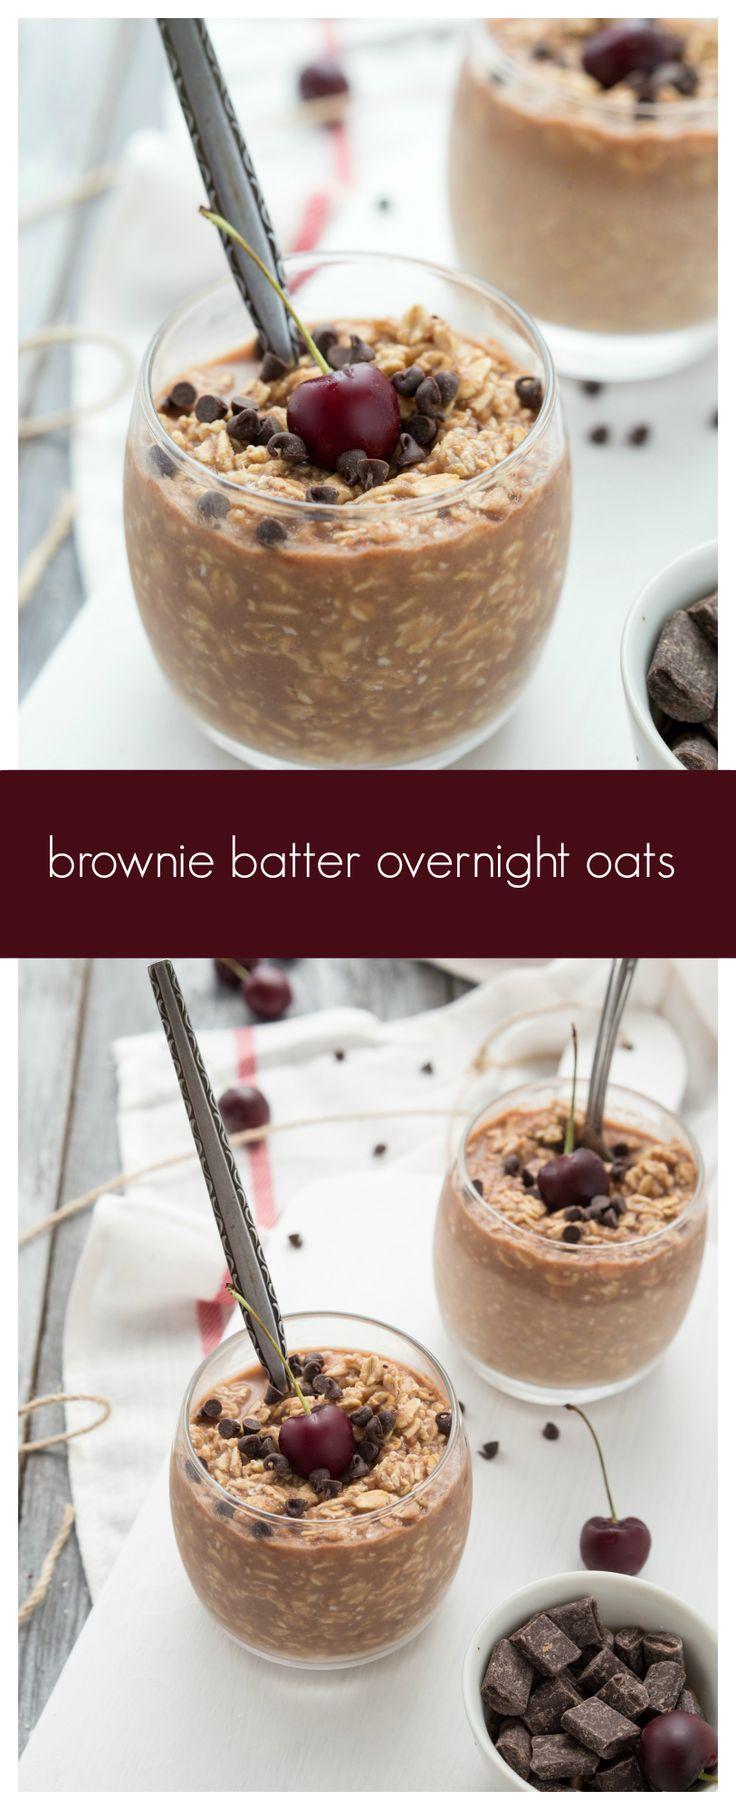 Double-Chocolate Brownie Batter Overnight Oats I via chelseasmessyapron.com I…